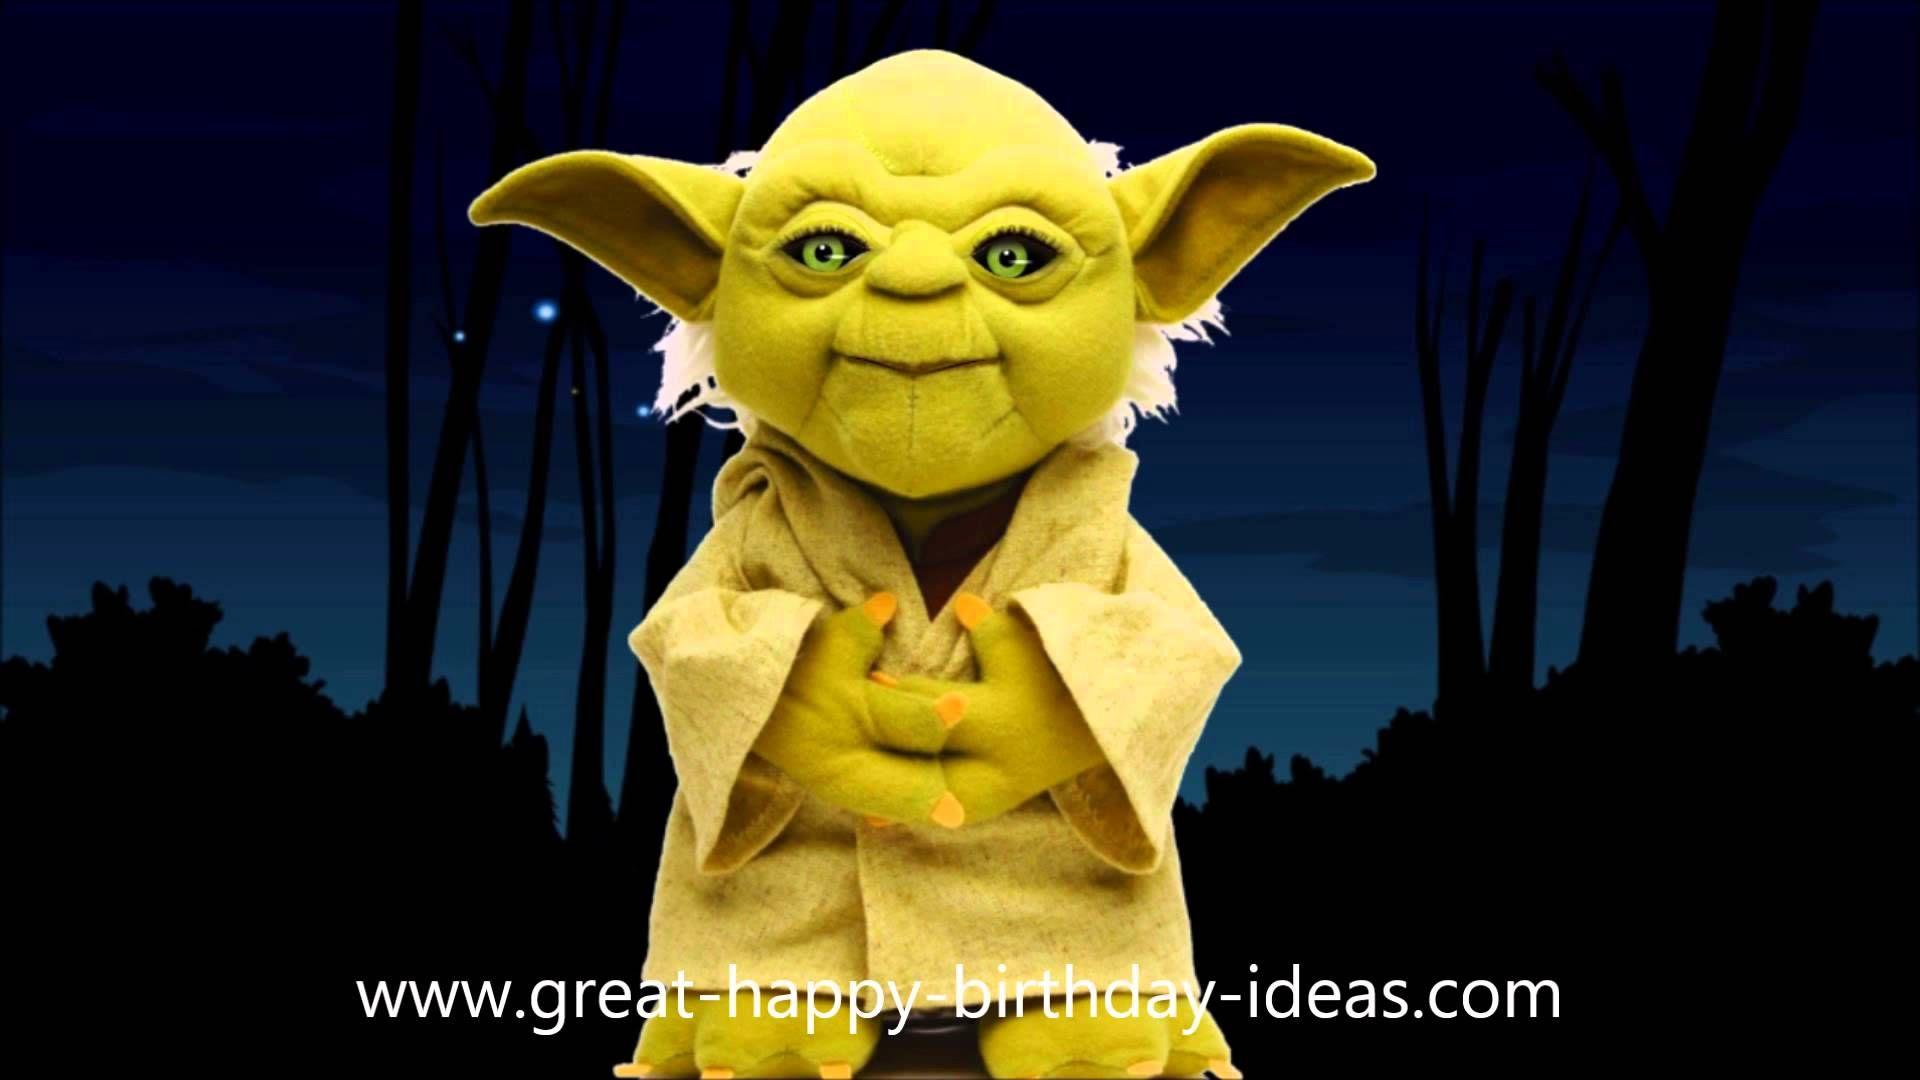 Yoda Sings Happy Birthday To You It S Funny Funny Happy Birthday Song Funny Happy Birthday Images Birthday Songs